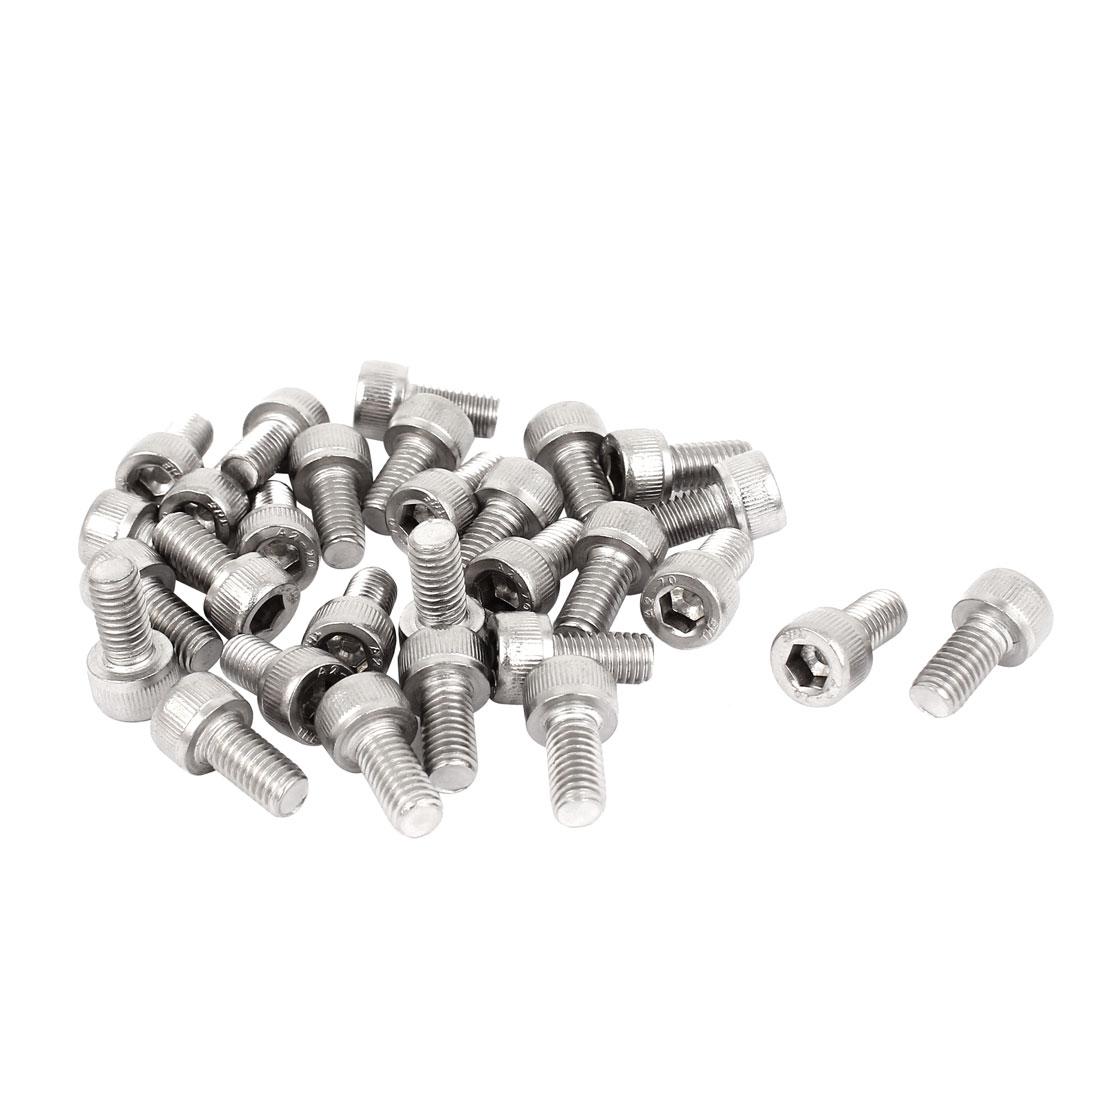 30 Pcs 0.8mm Pitch M5x10mm Stainless Steel Hex Key Socket Head Cap Screws Bolts